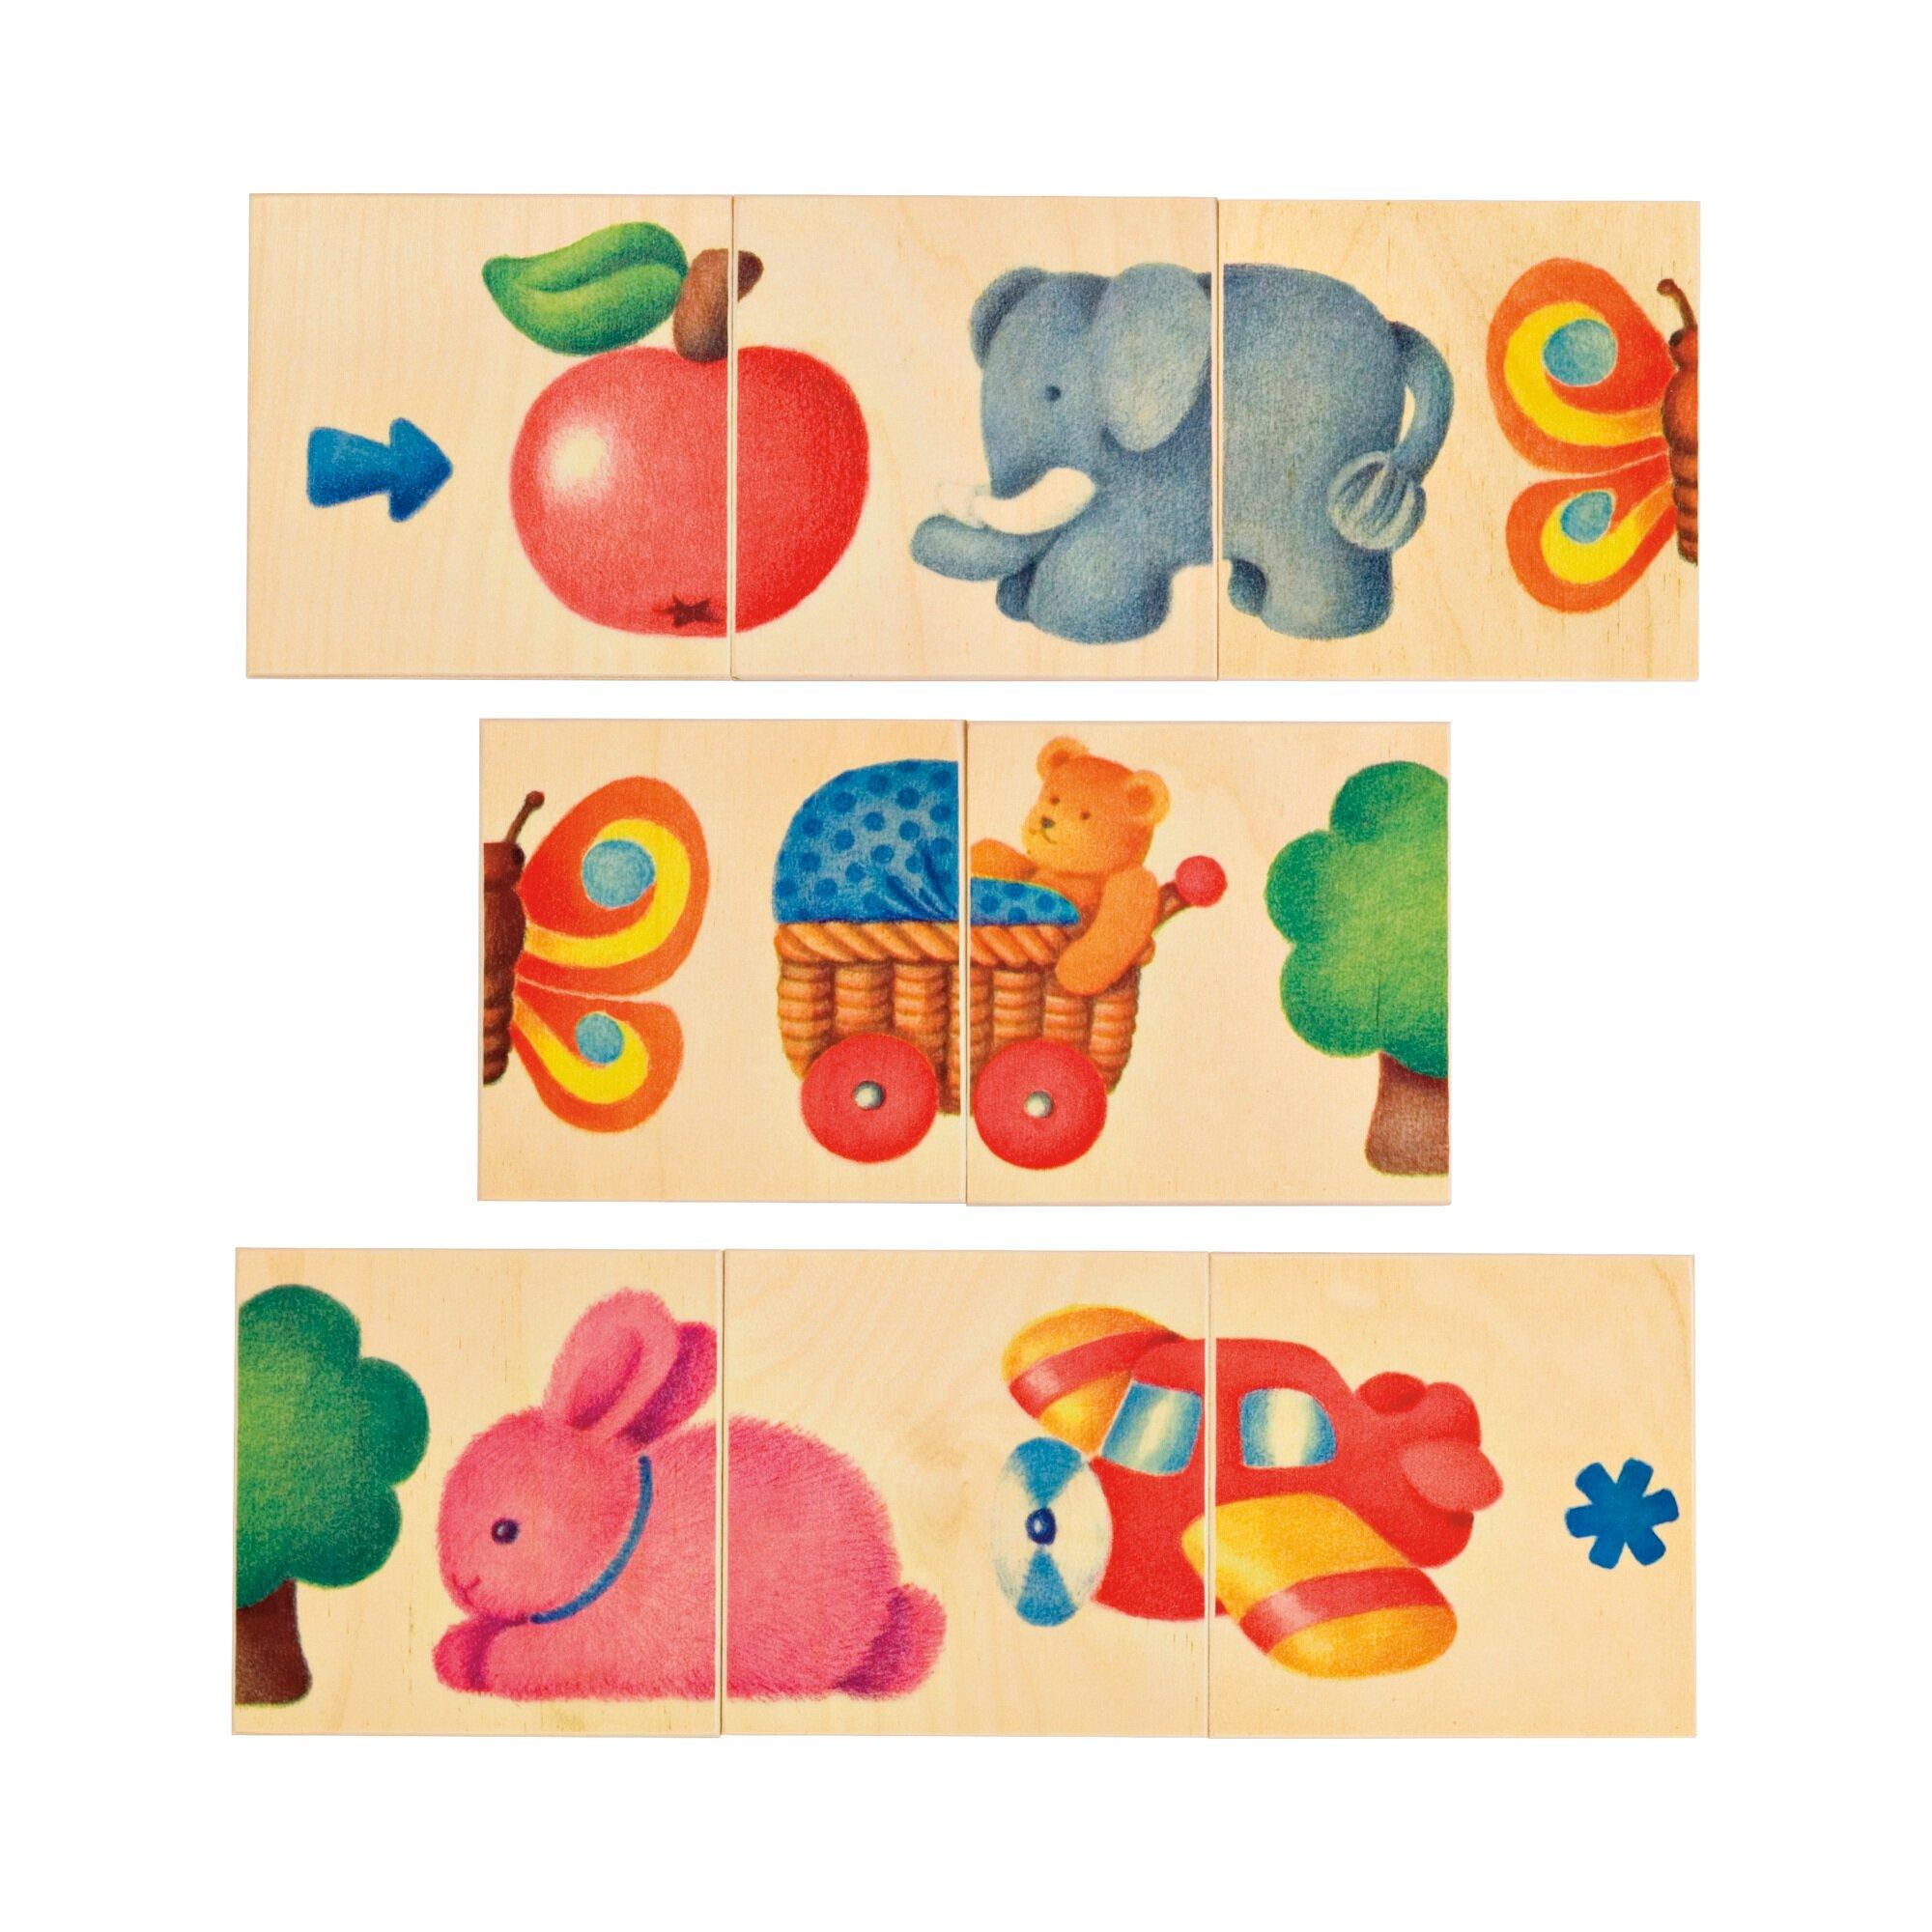 selecta-legespiel-bilderkette